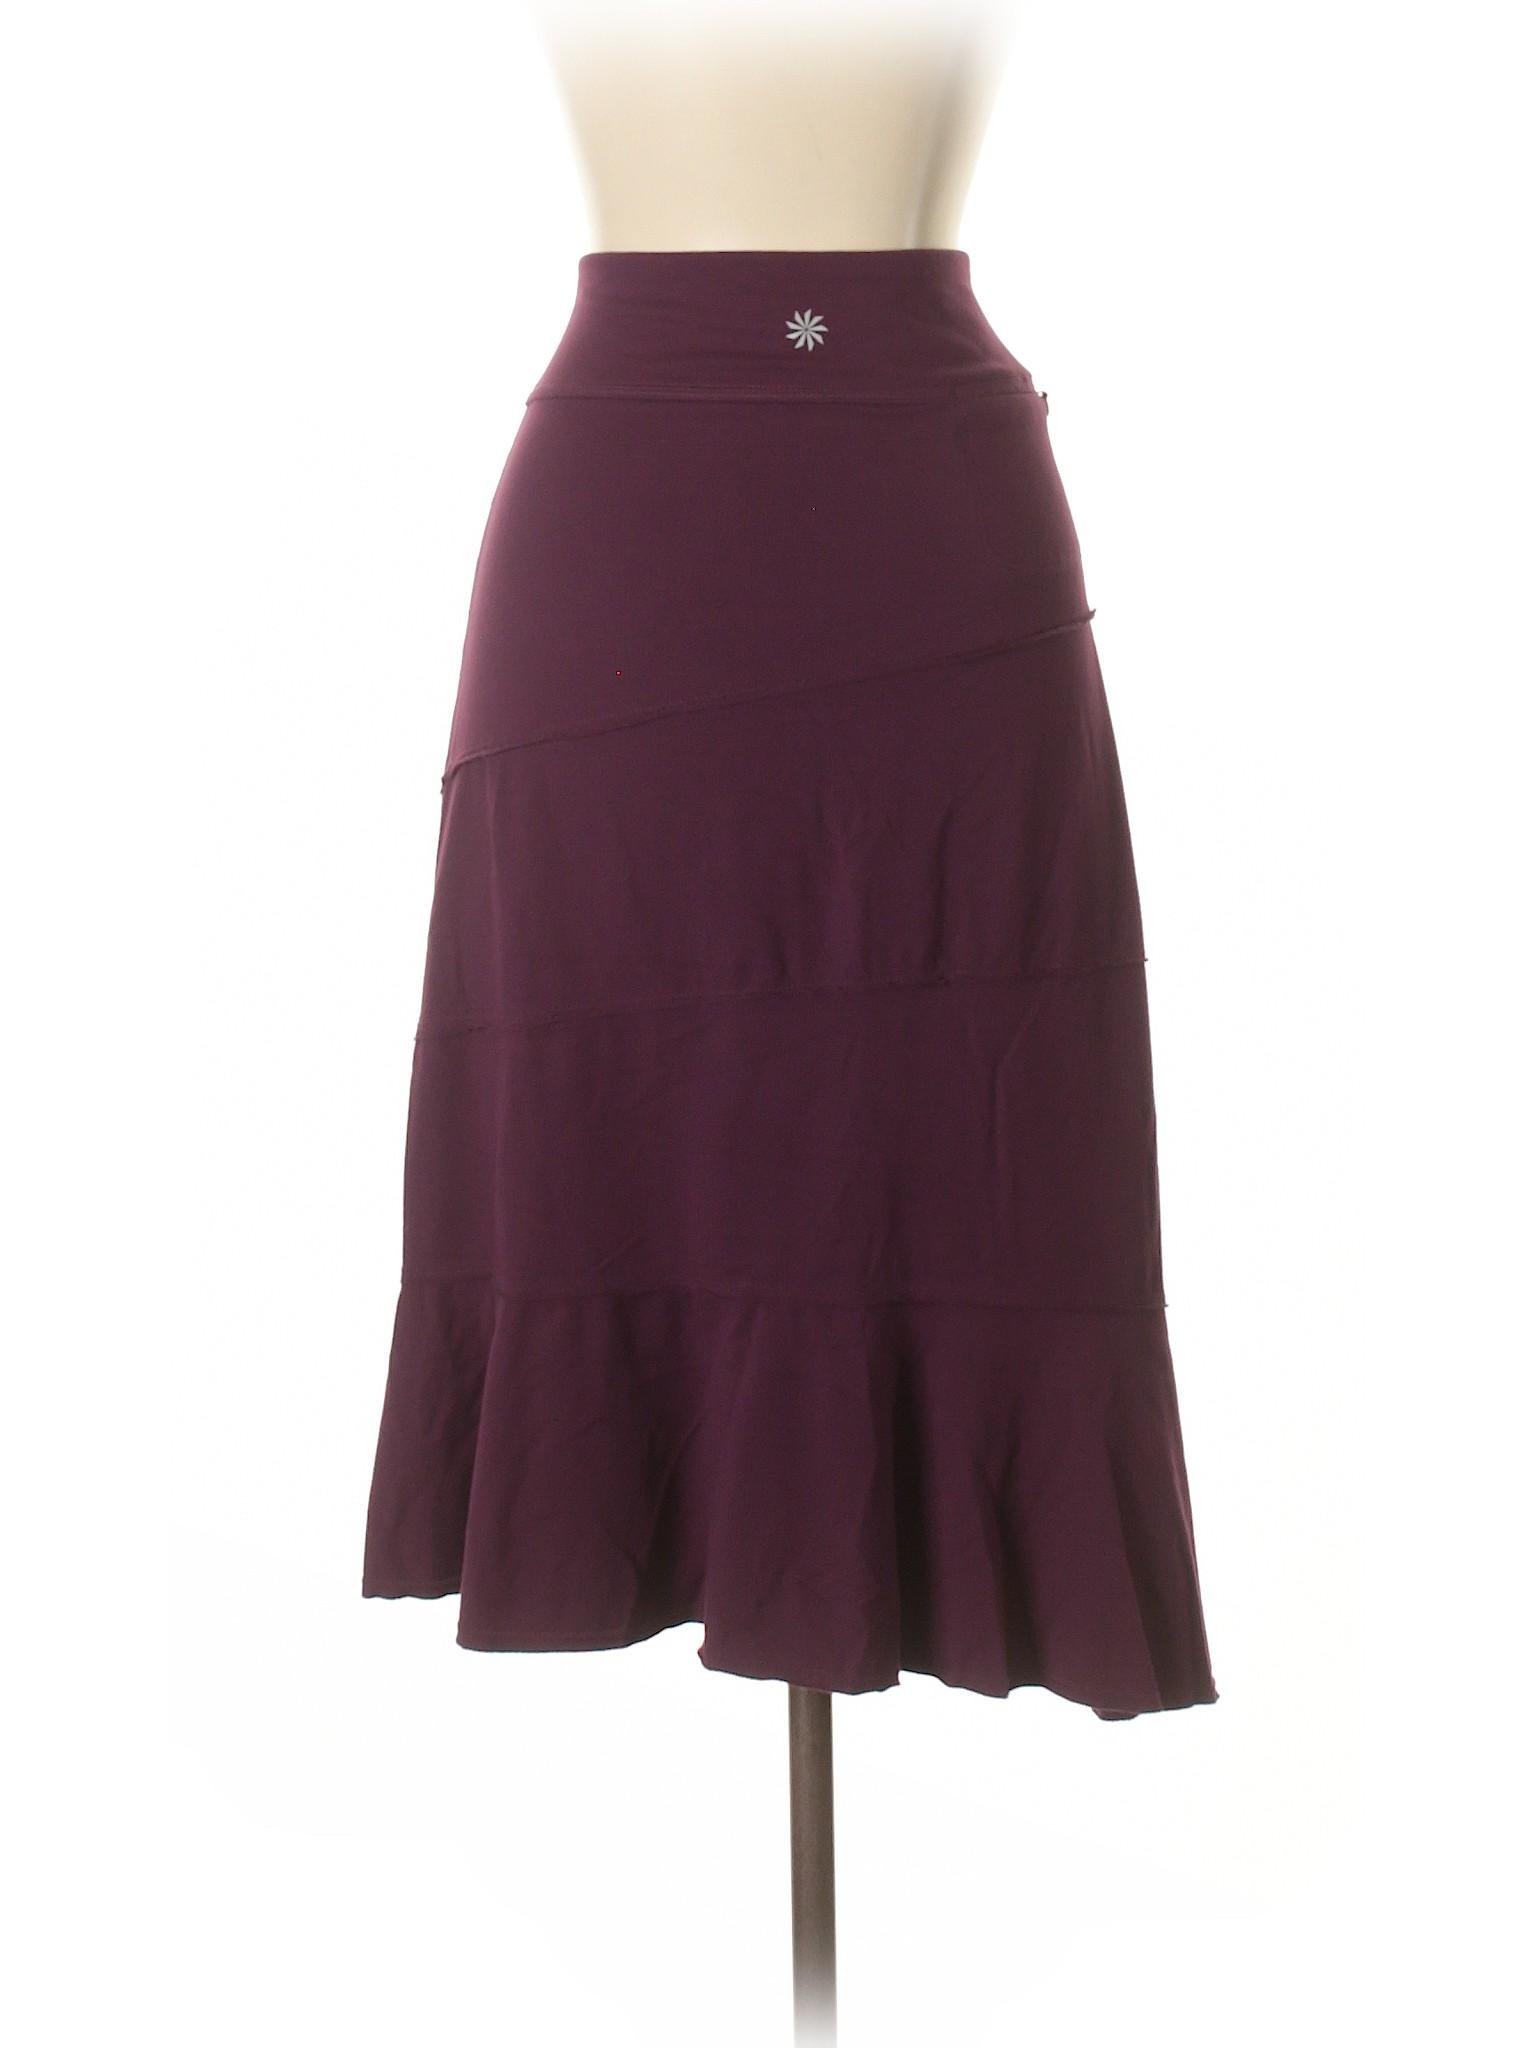 Casual Boutique Boutique Skirt Casual Boutique Skirt WqpnHIOy